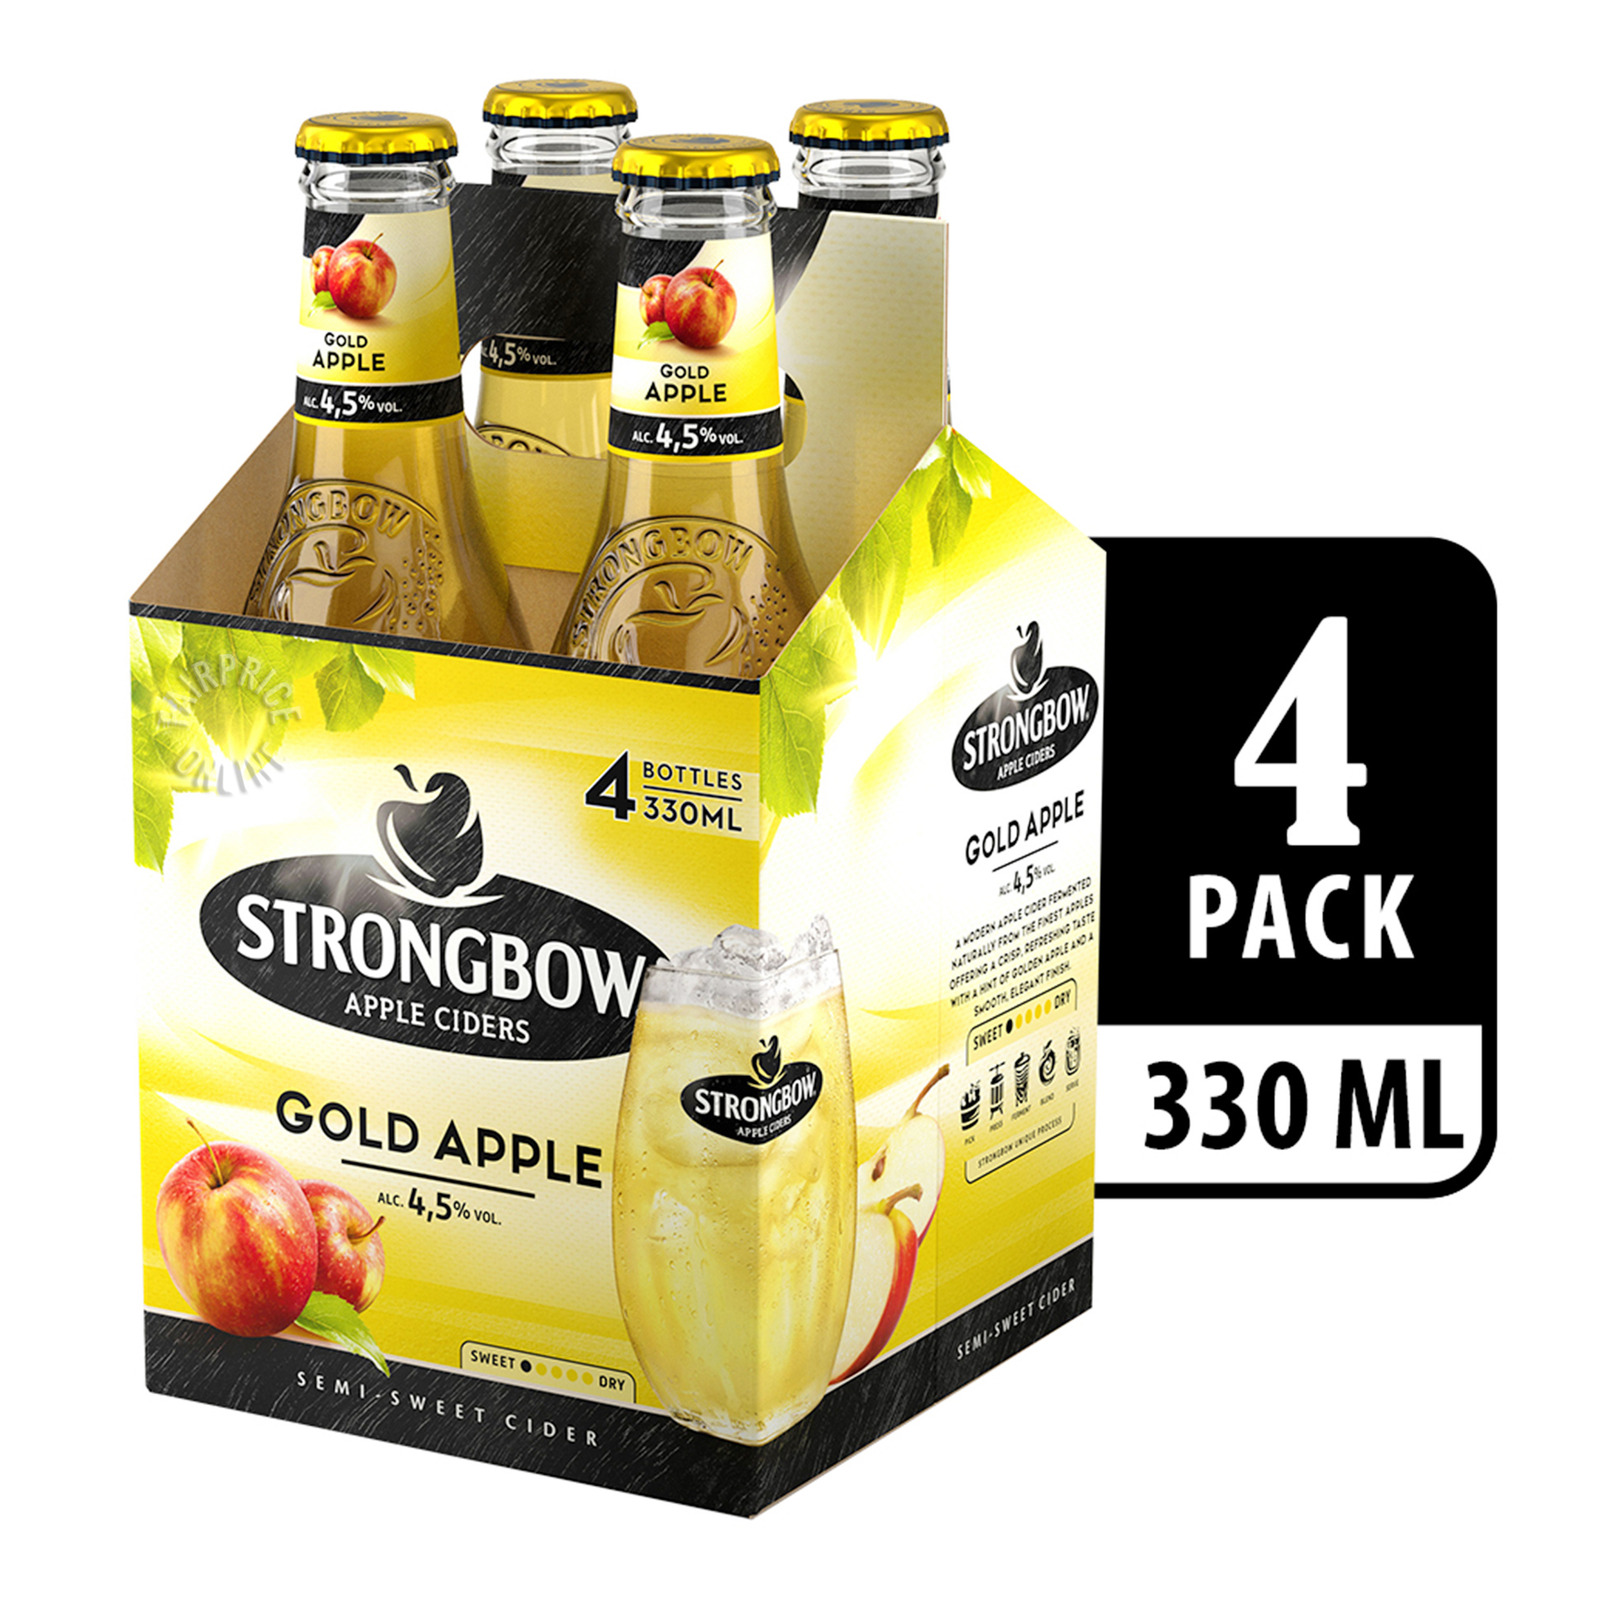 Strongbow Apple Bottle Cider - Gold Apple